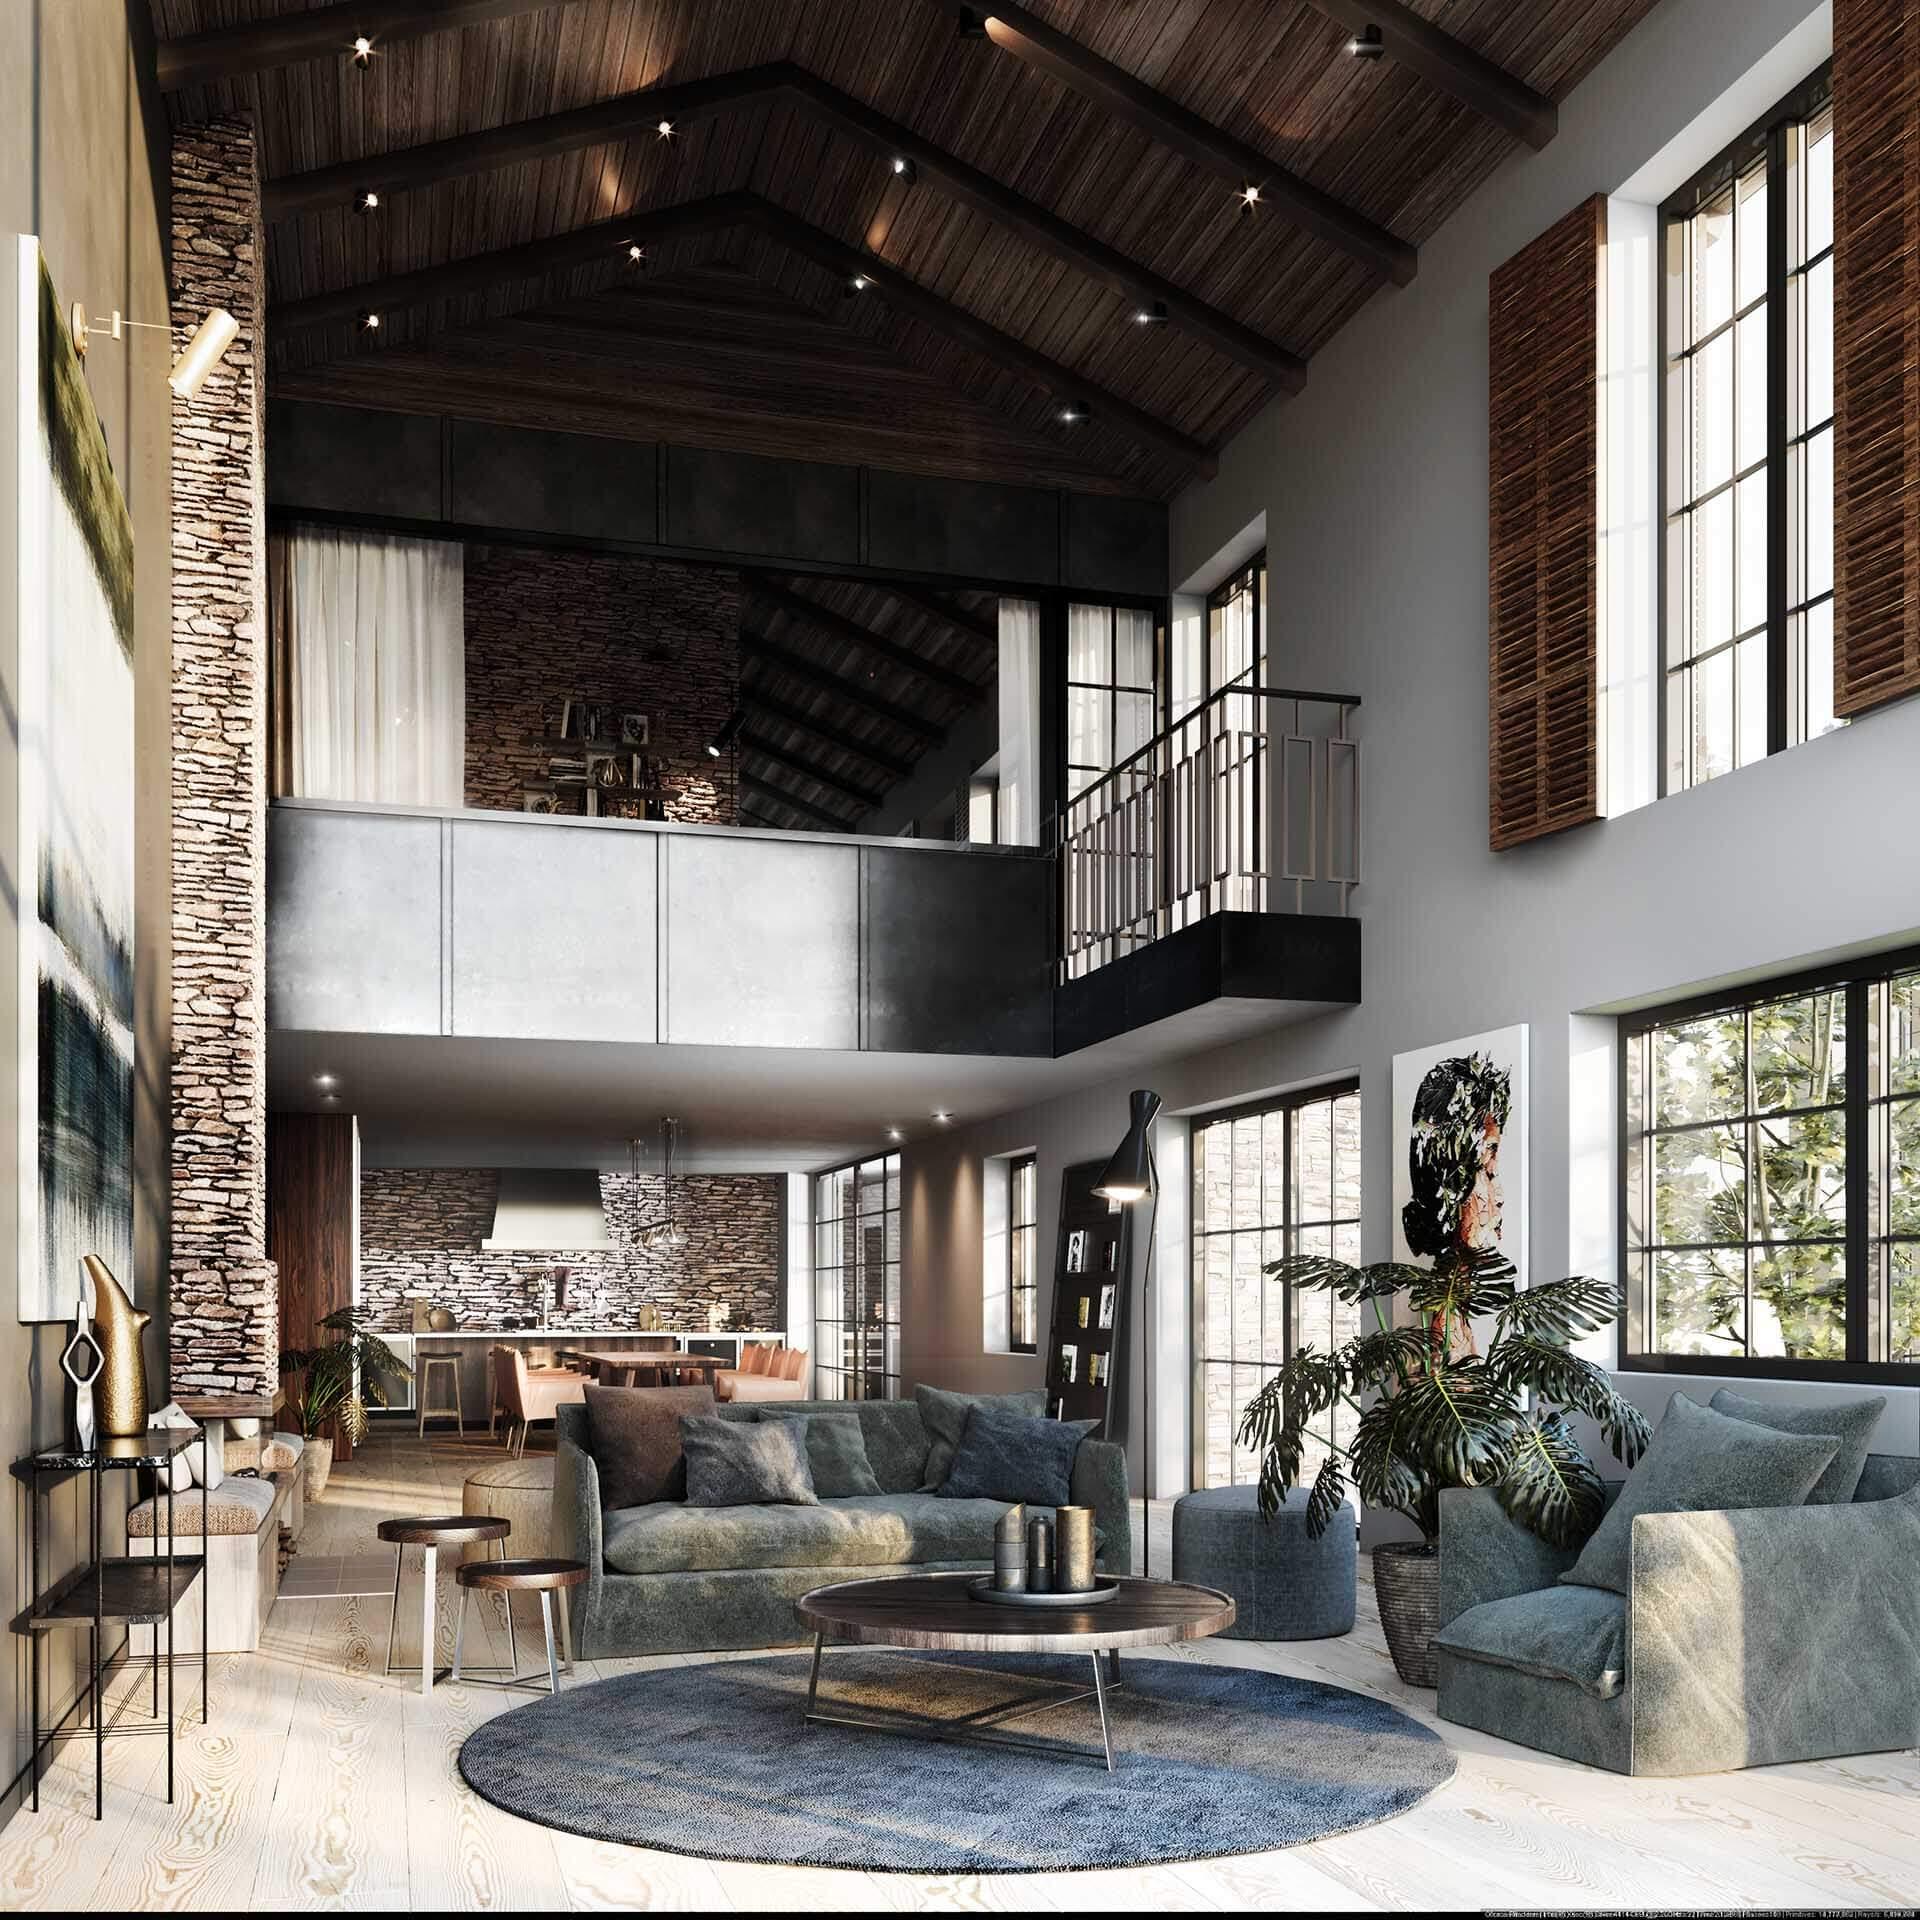 3D-Vizual | 3D Visualisering | Køkkenalrum | Arkitekt 12 - Hus Piemonte